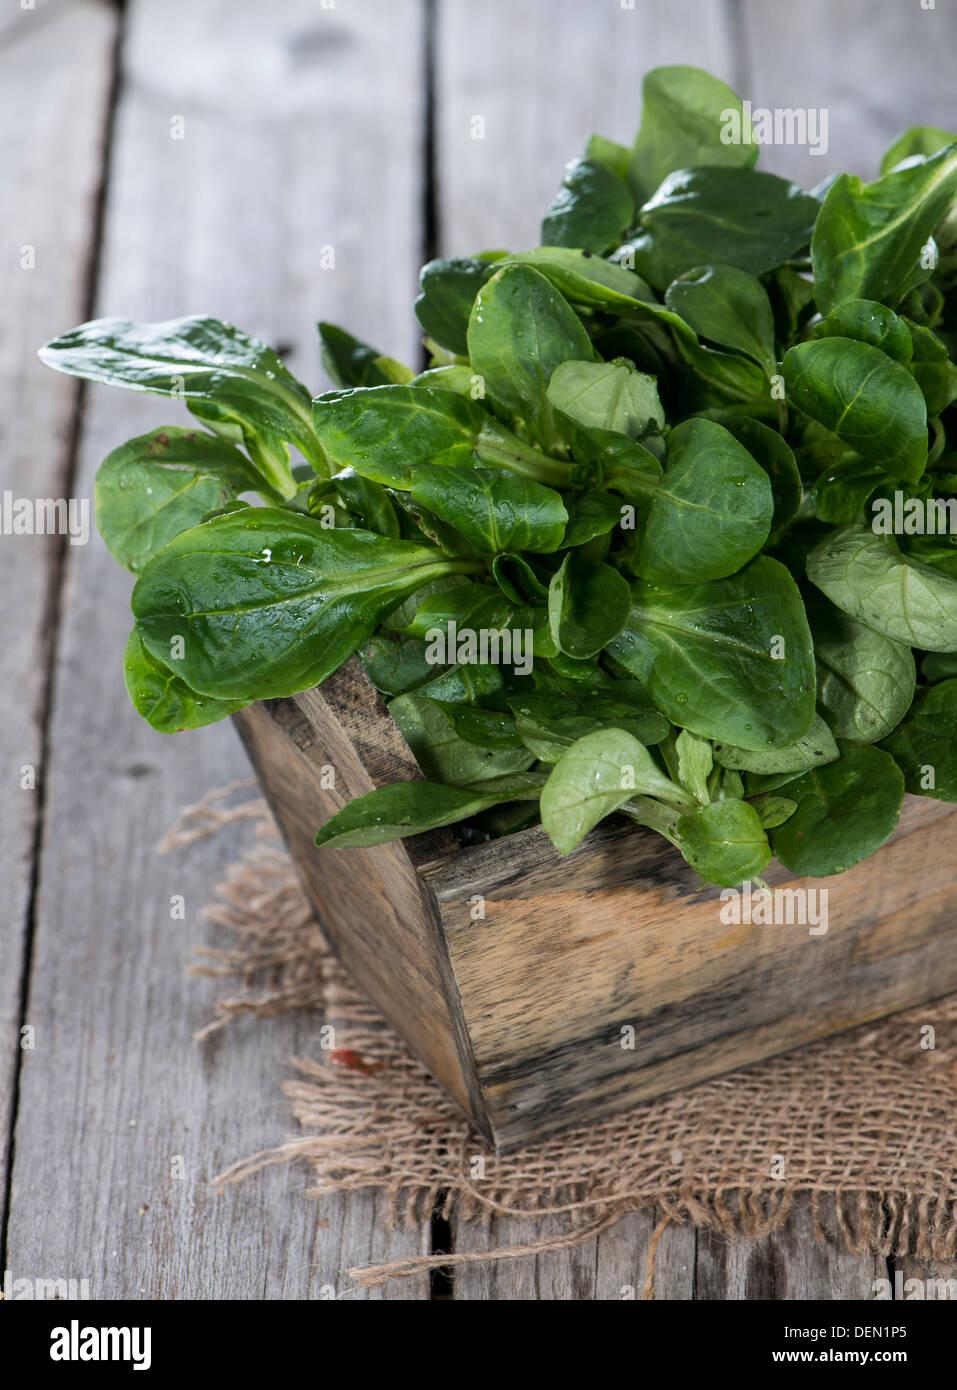 Portion of Lamb's Lettuce on vintage wooden background - Stock Image